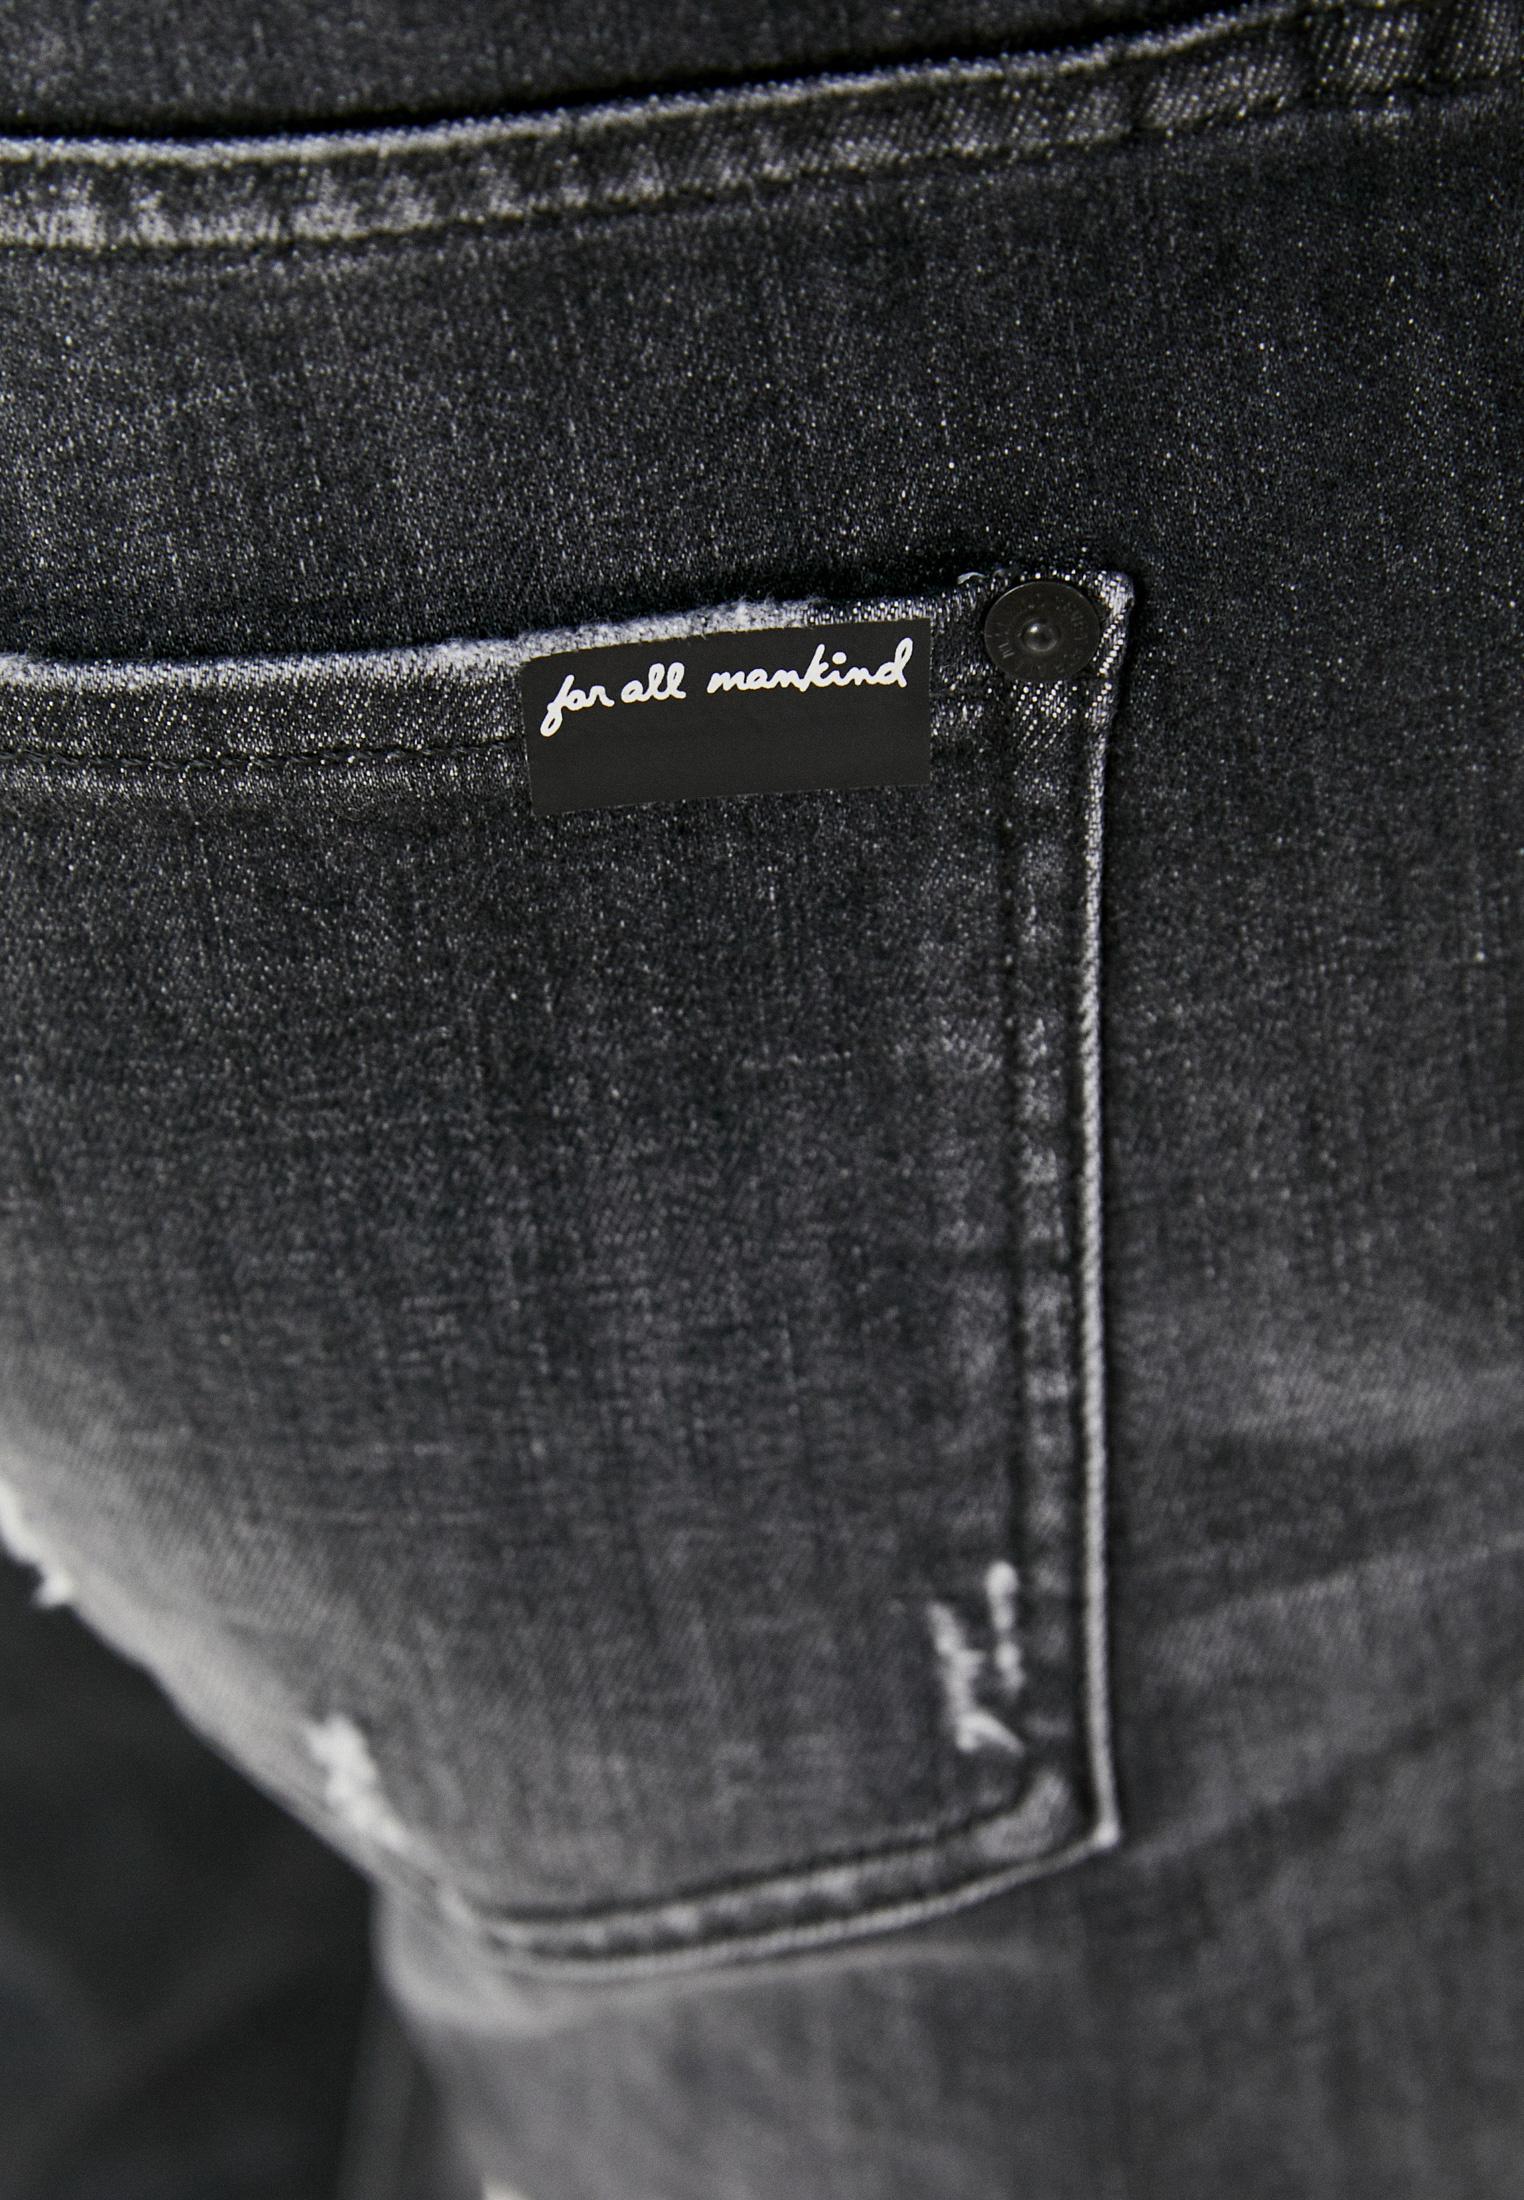 Зауженные джинсы 7 For All Mankind (7 Фо Олл Мэнкайнд) JSMXU790TH: изображение 5